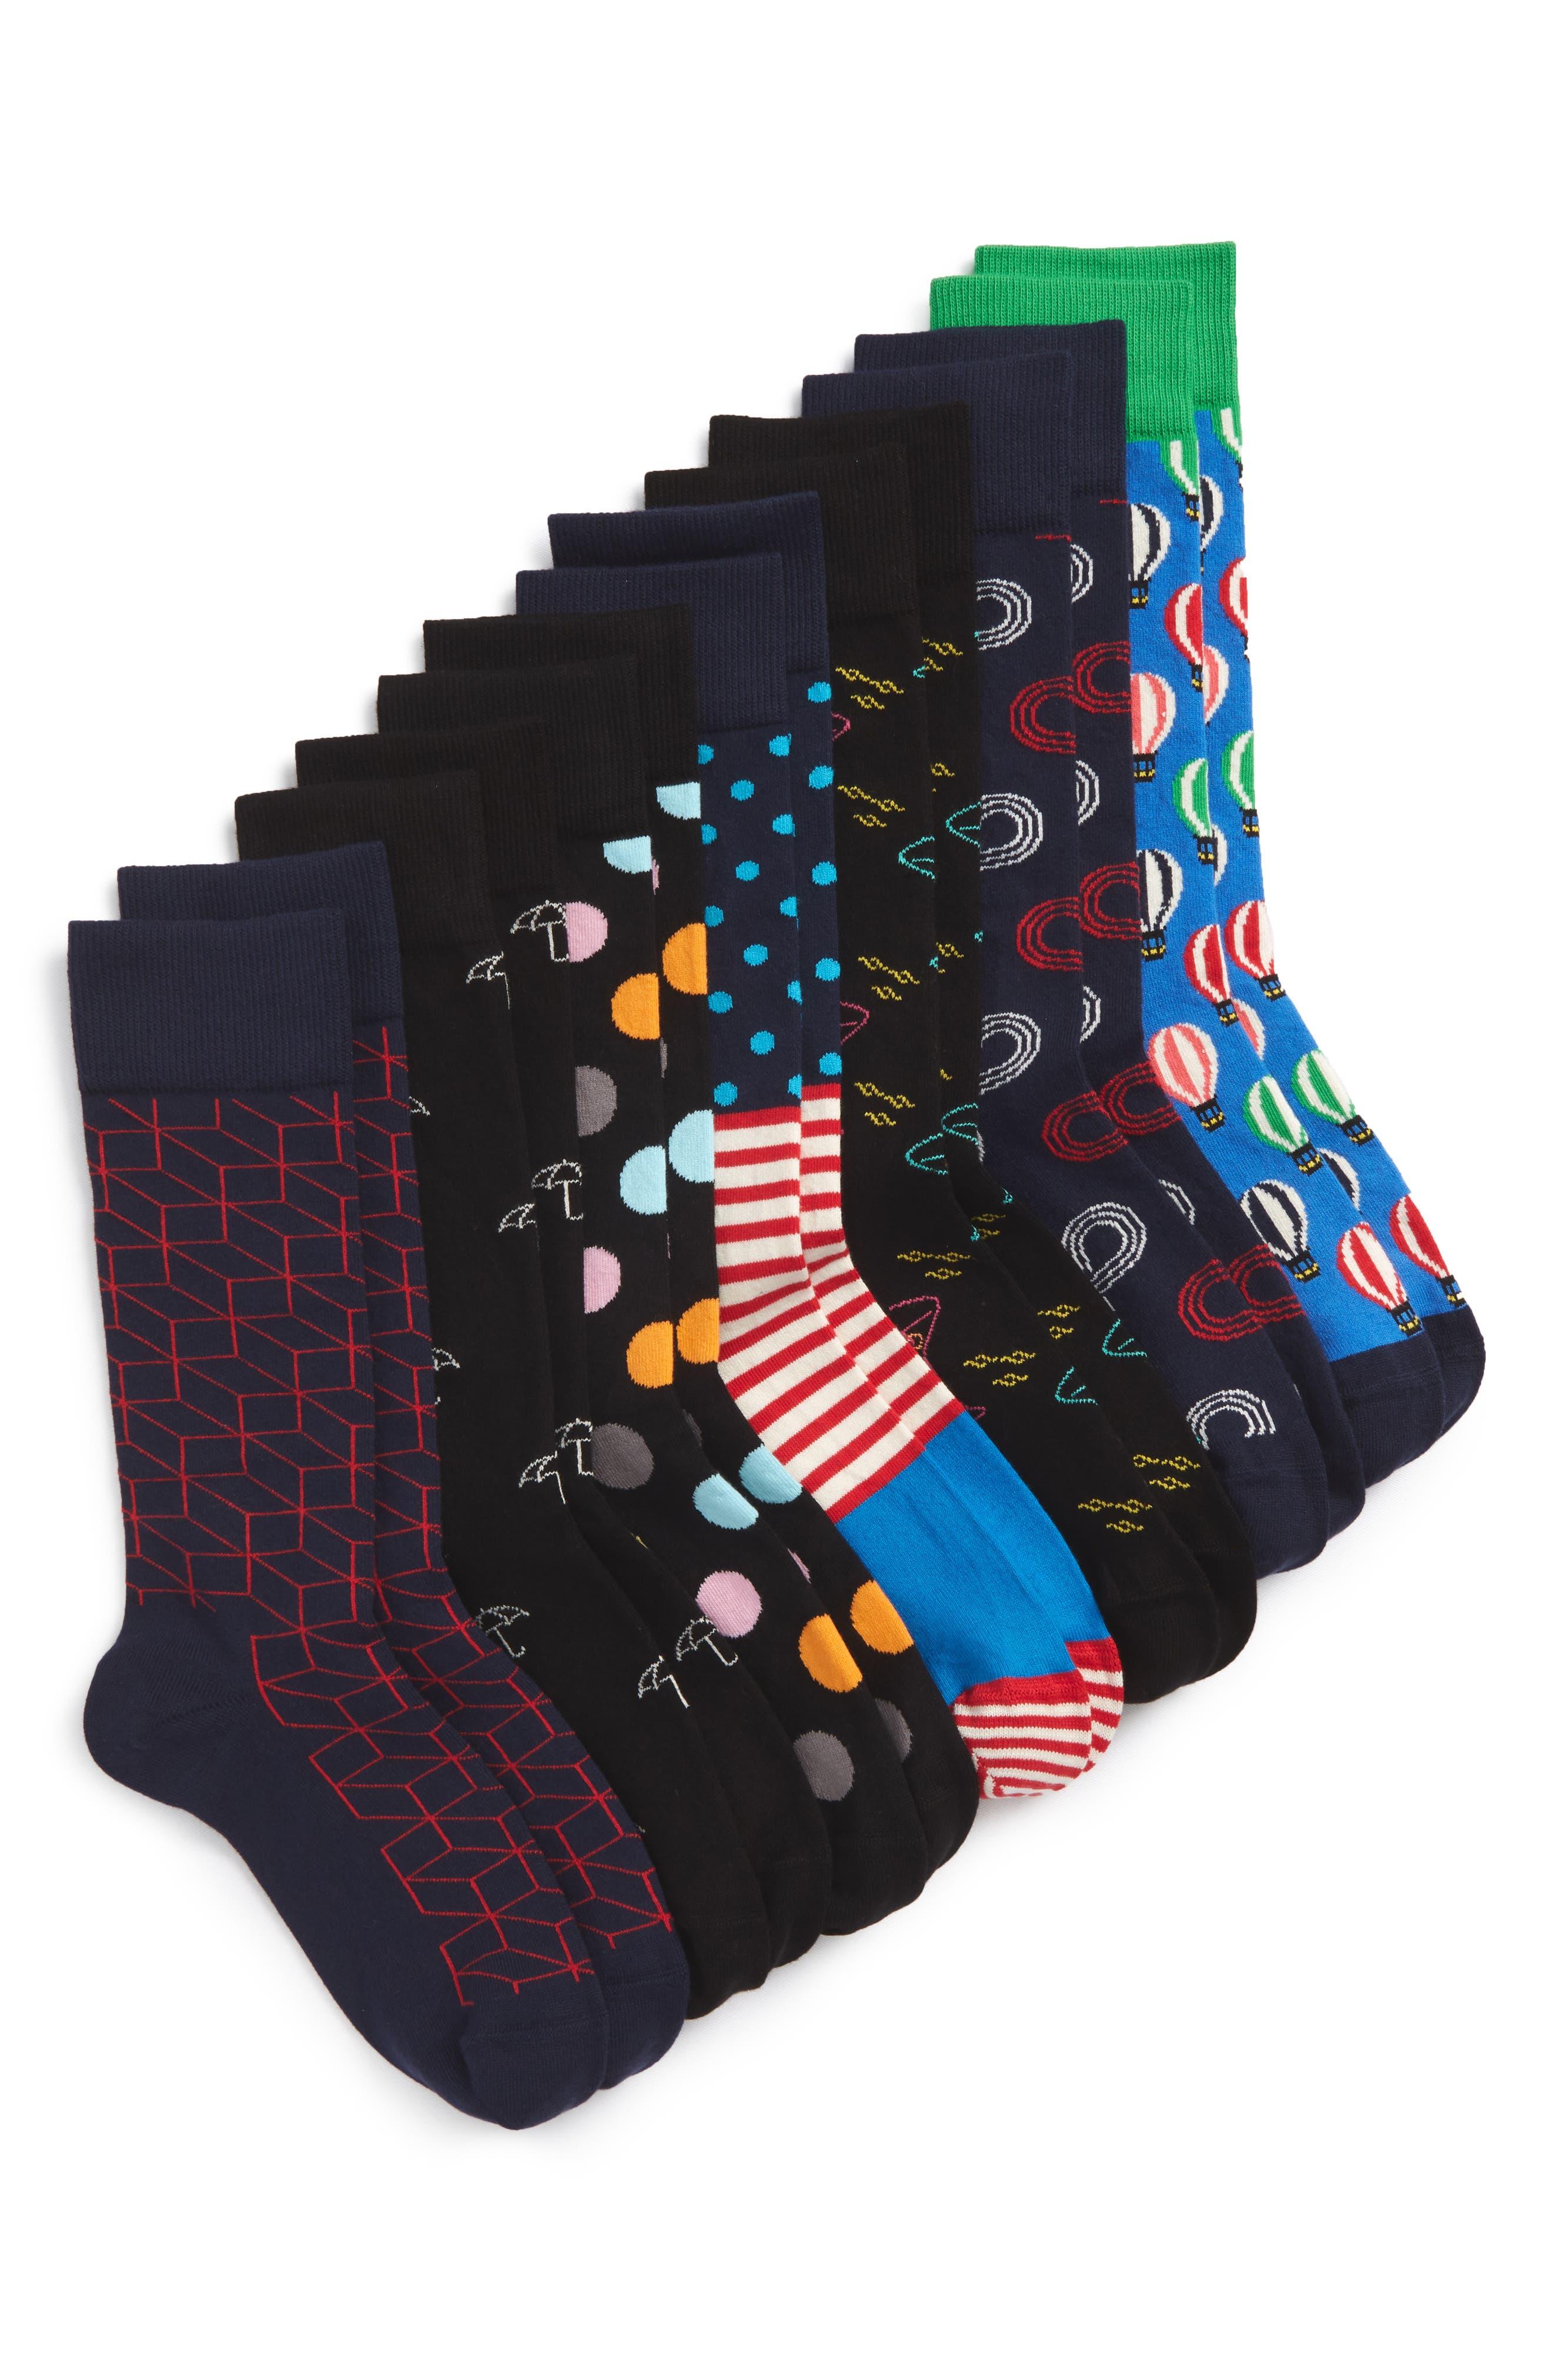 7 Days Assorted 7-Pack Socks Gift Set,                         Main,                         color, 459